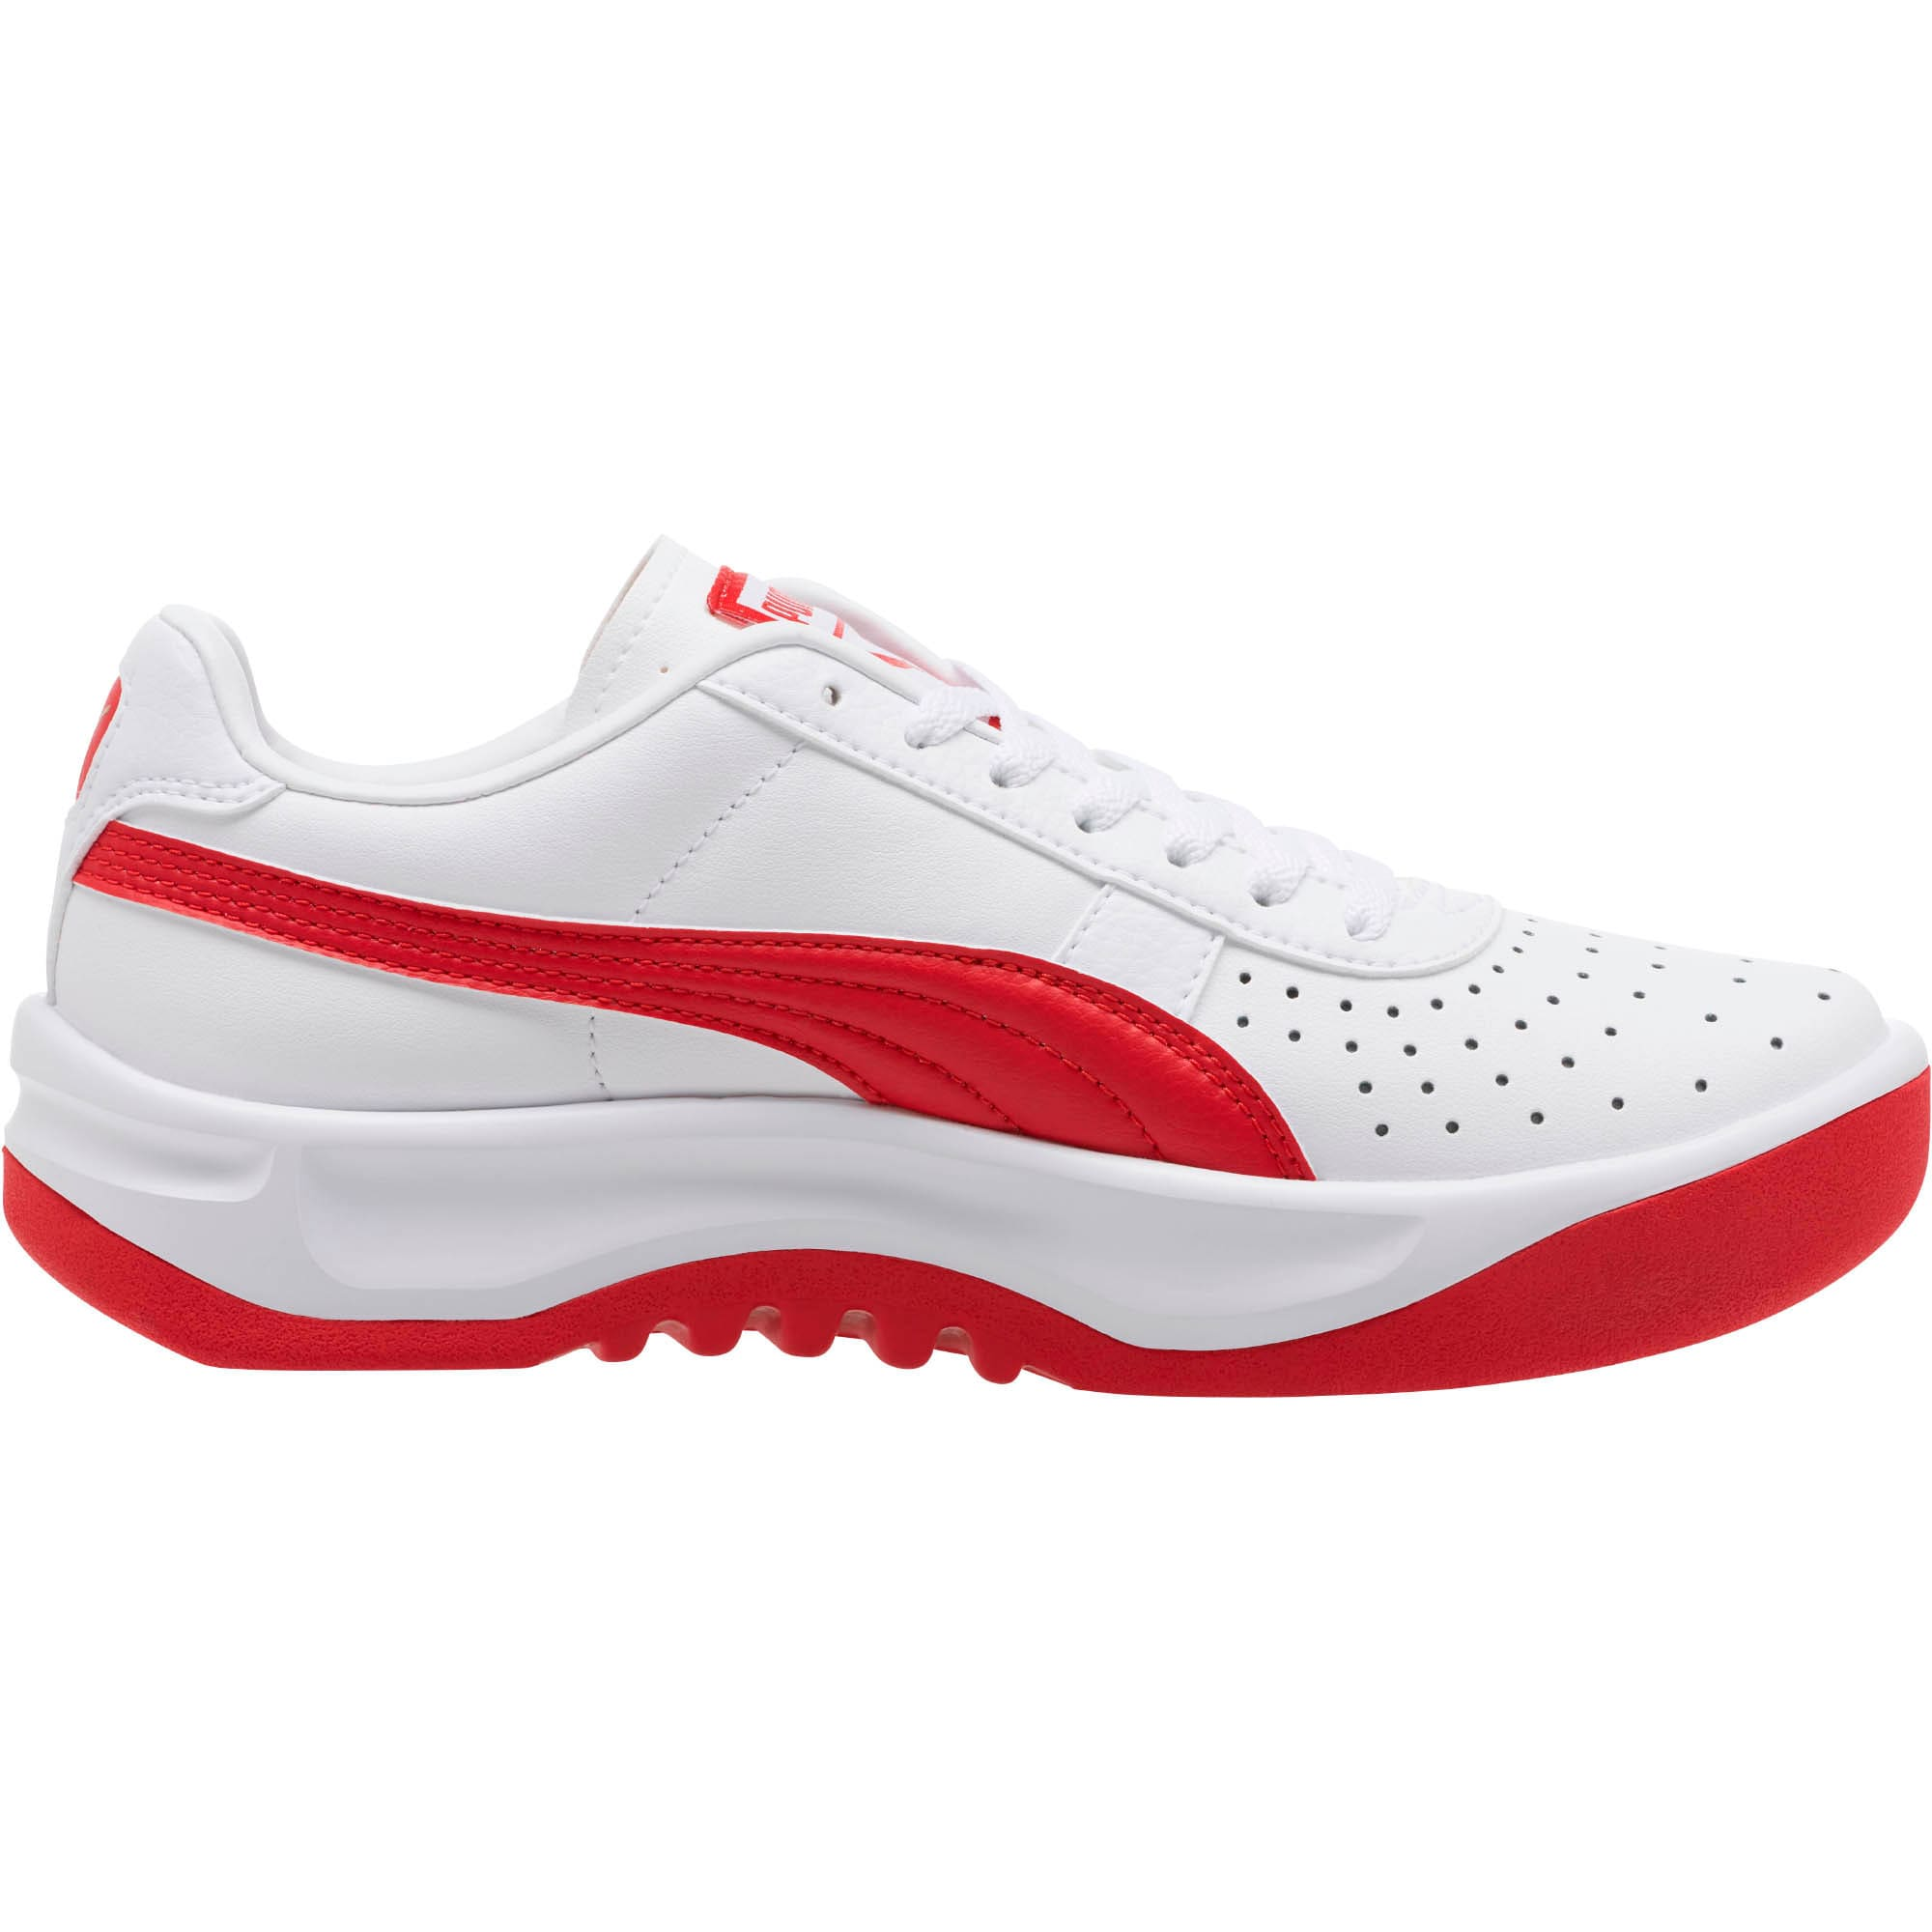 Thumbnail 3 of GV Special Sneakers JR, Puma White-Ribbon Red, medium